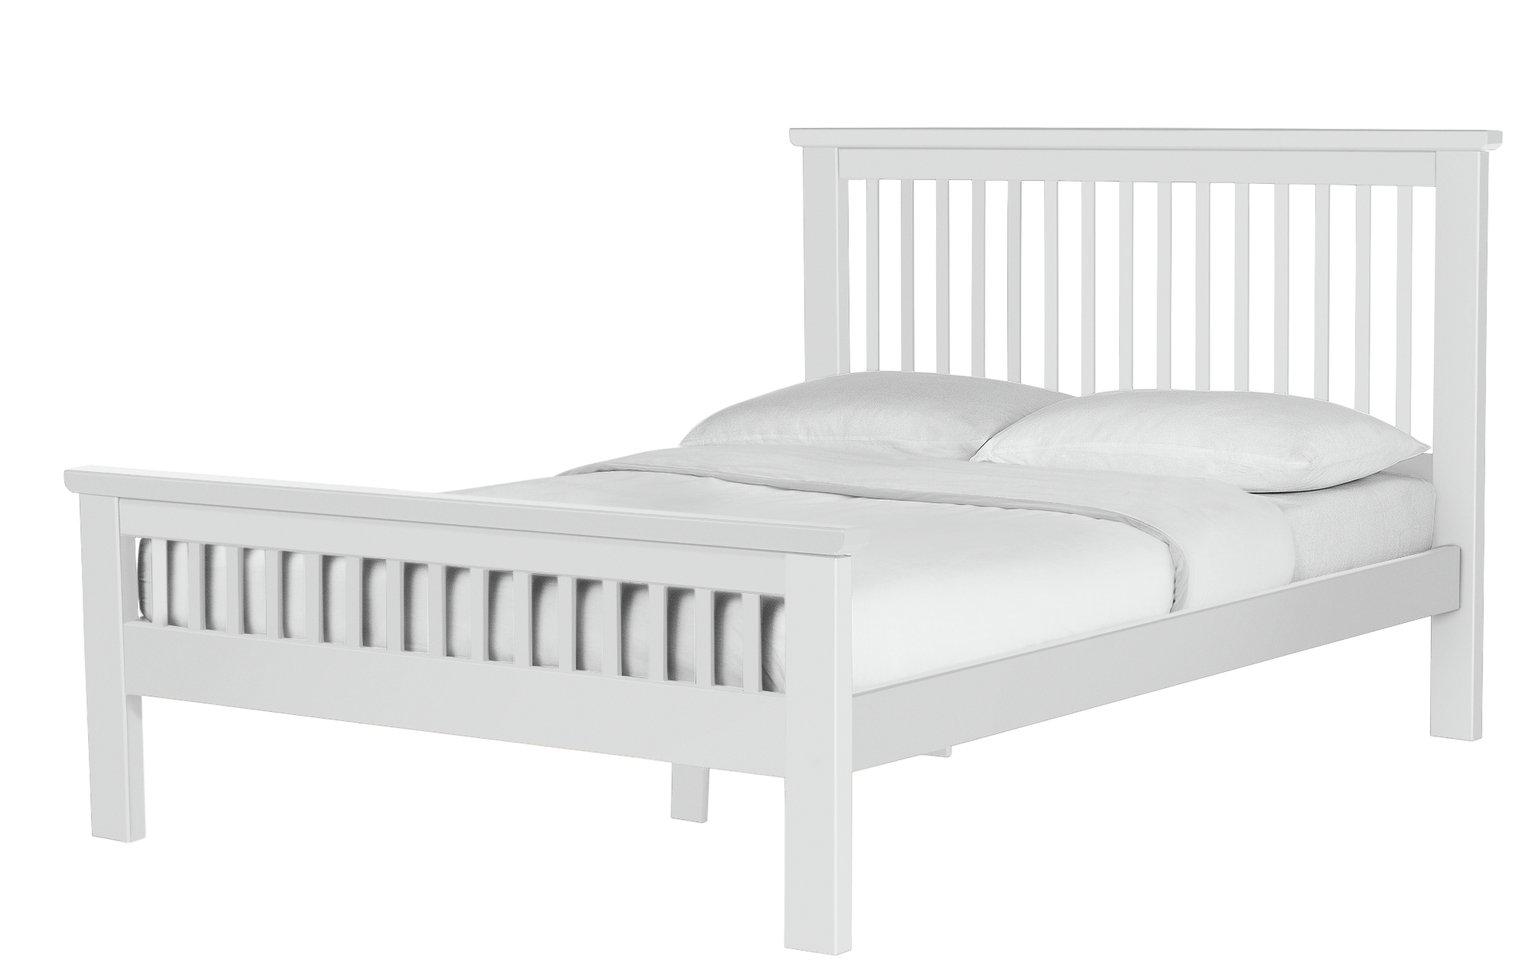 Argos Home Aubrey Double Bed Frame - White